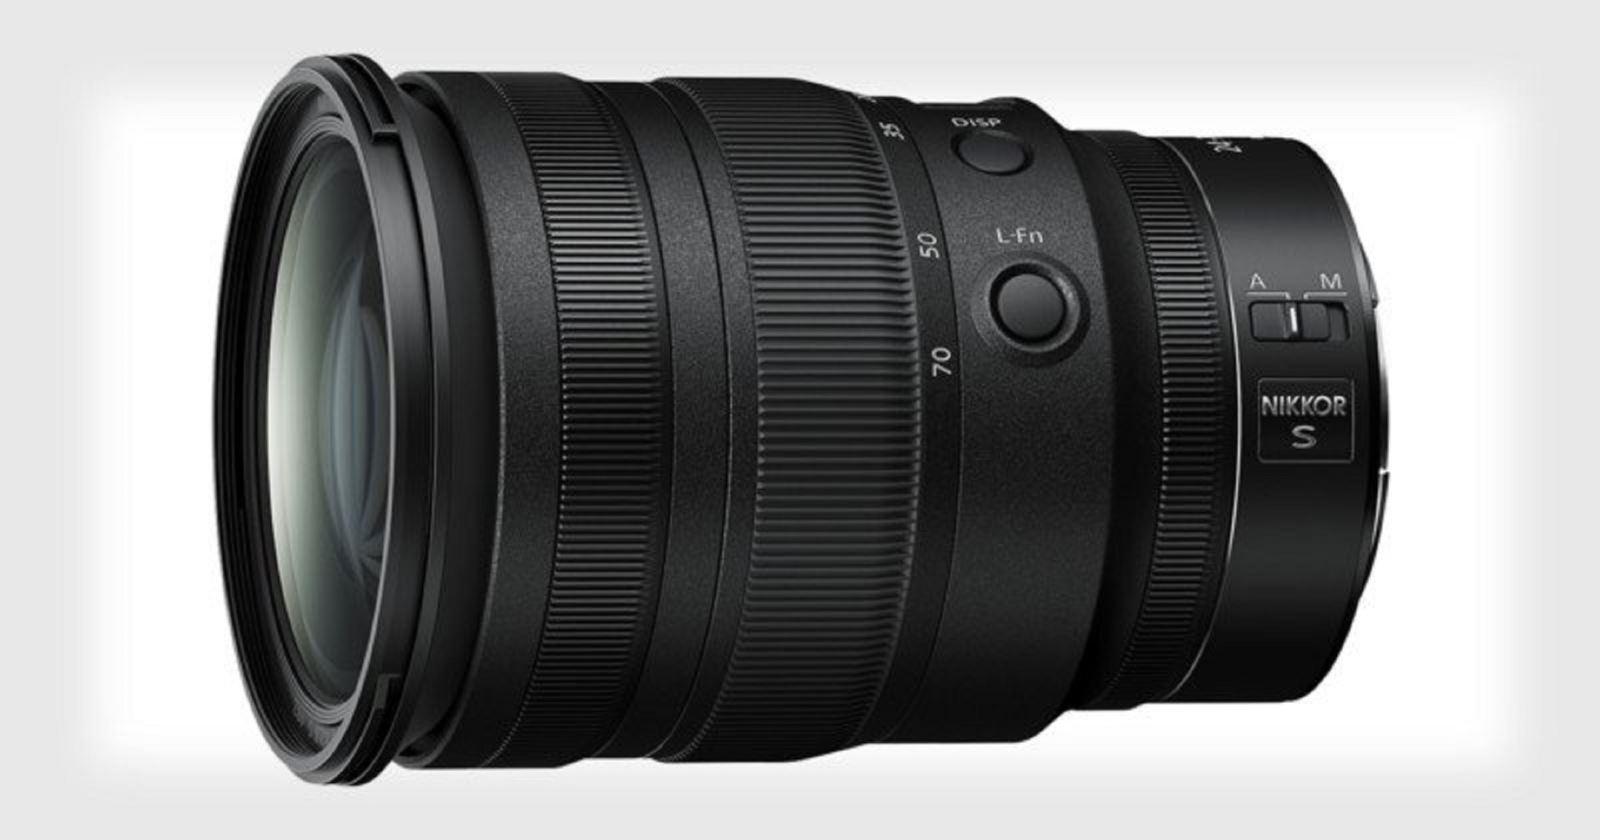 Nikon ra mắt ống kính Nikkor Z 24-70mm f/2.8S